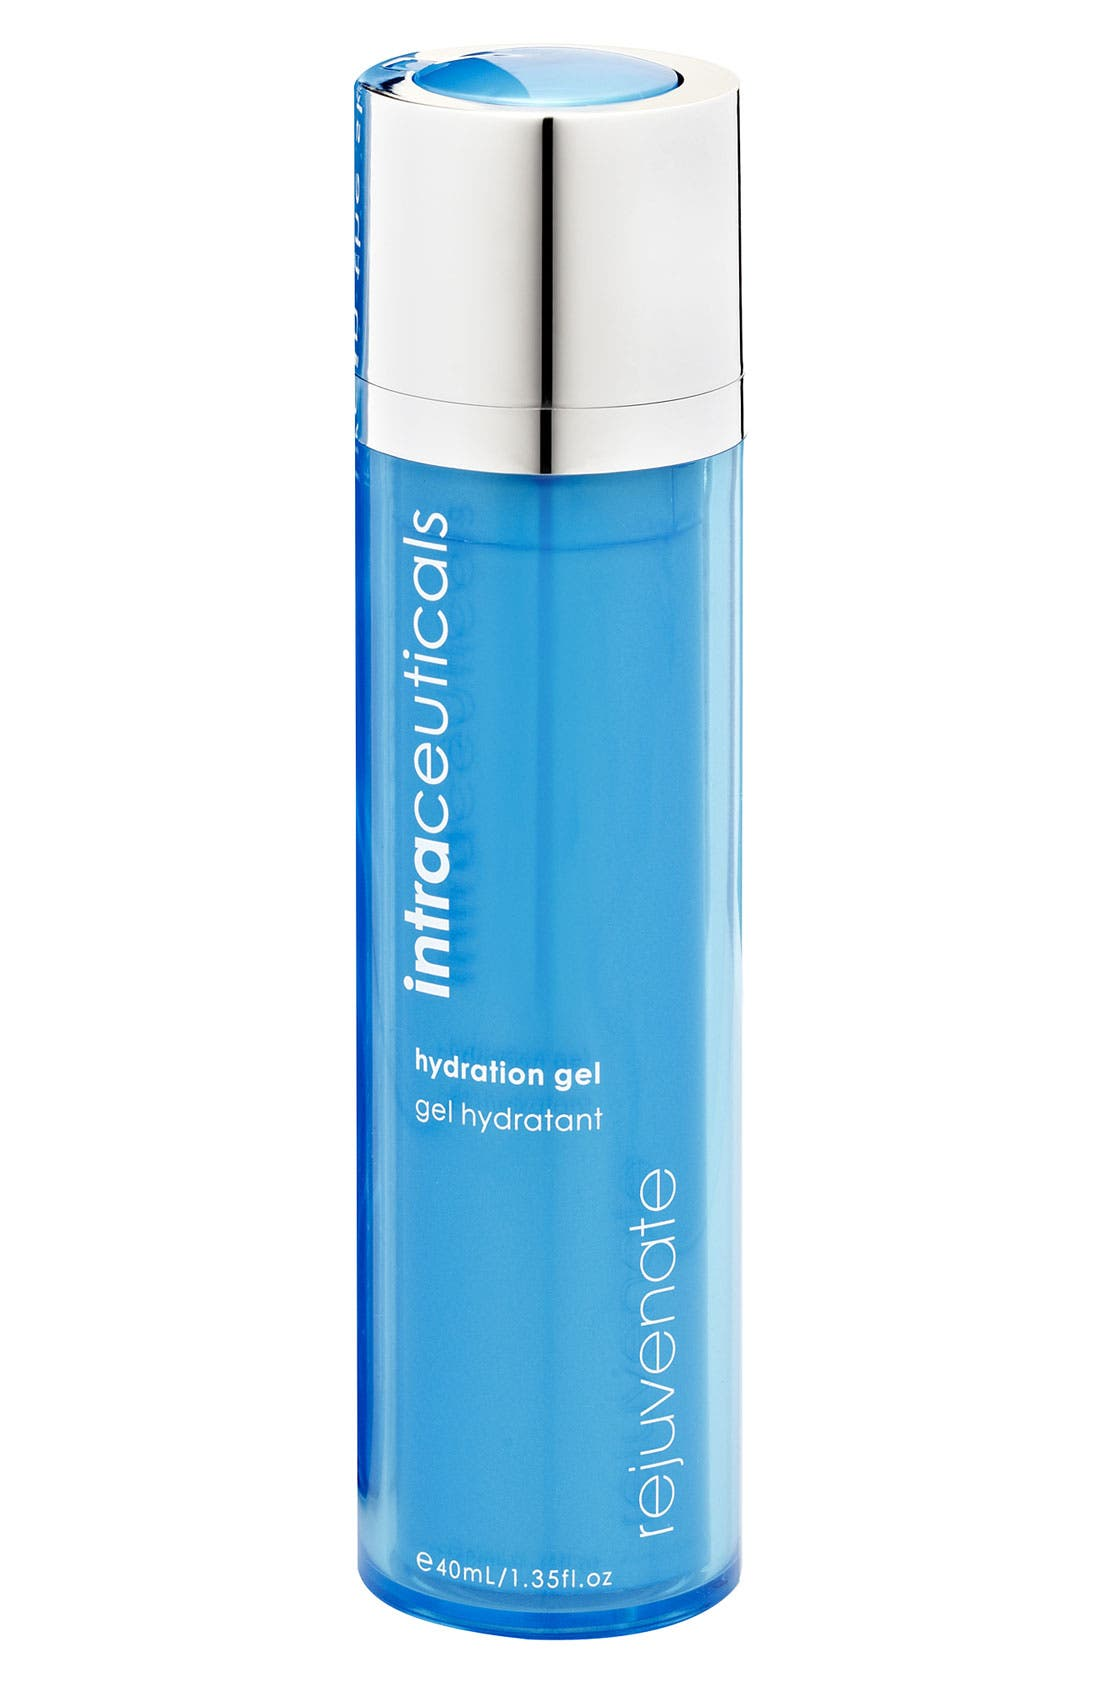 intraceuticals® 'Rejuvenate' Hydration Gel